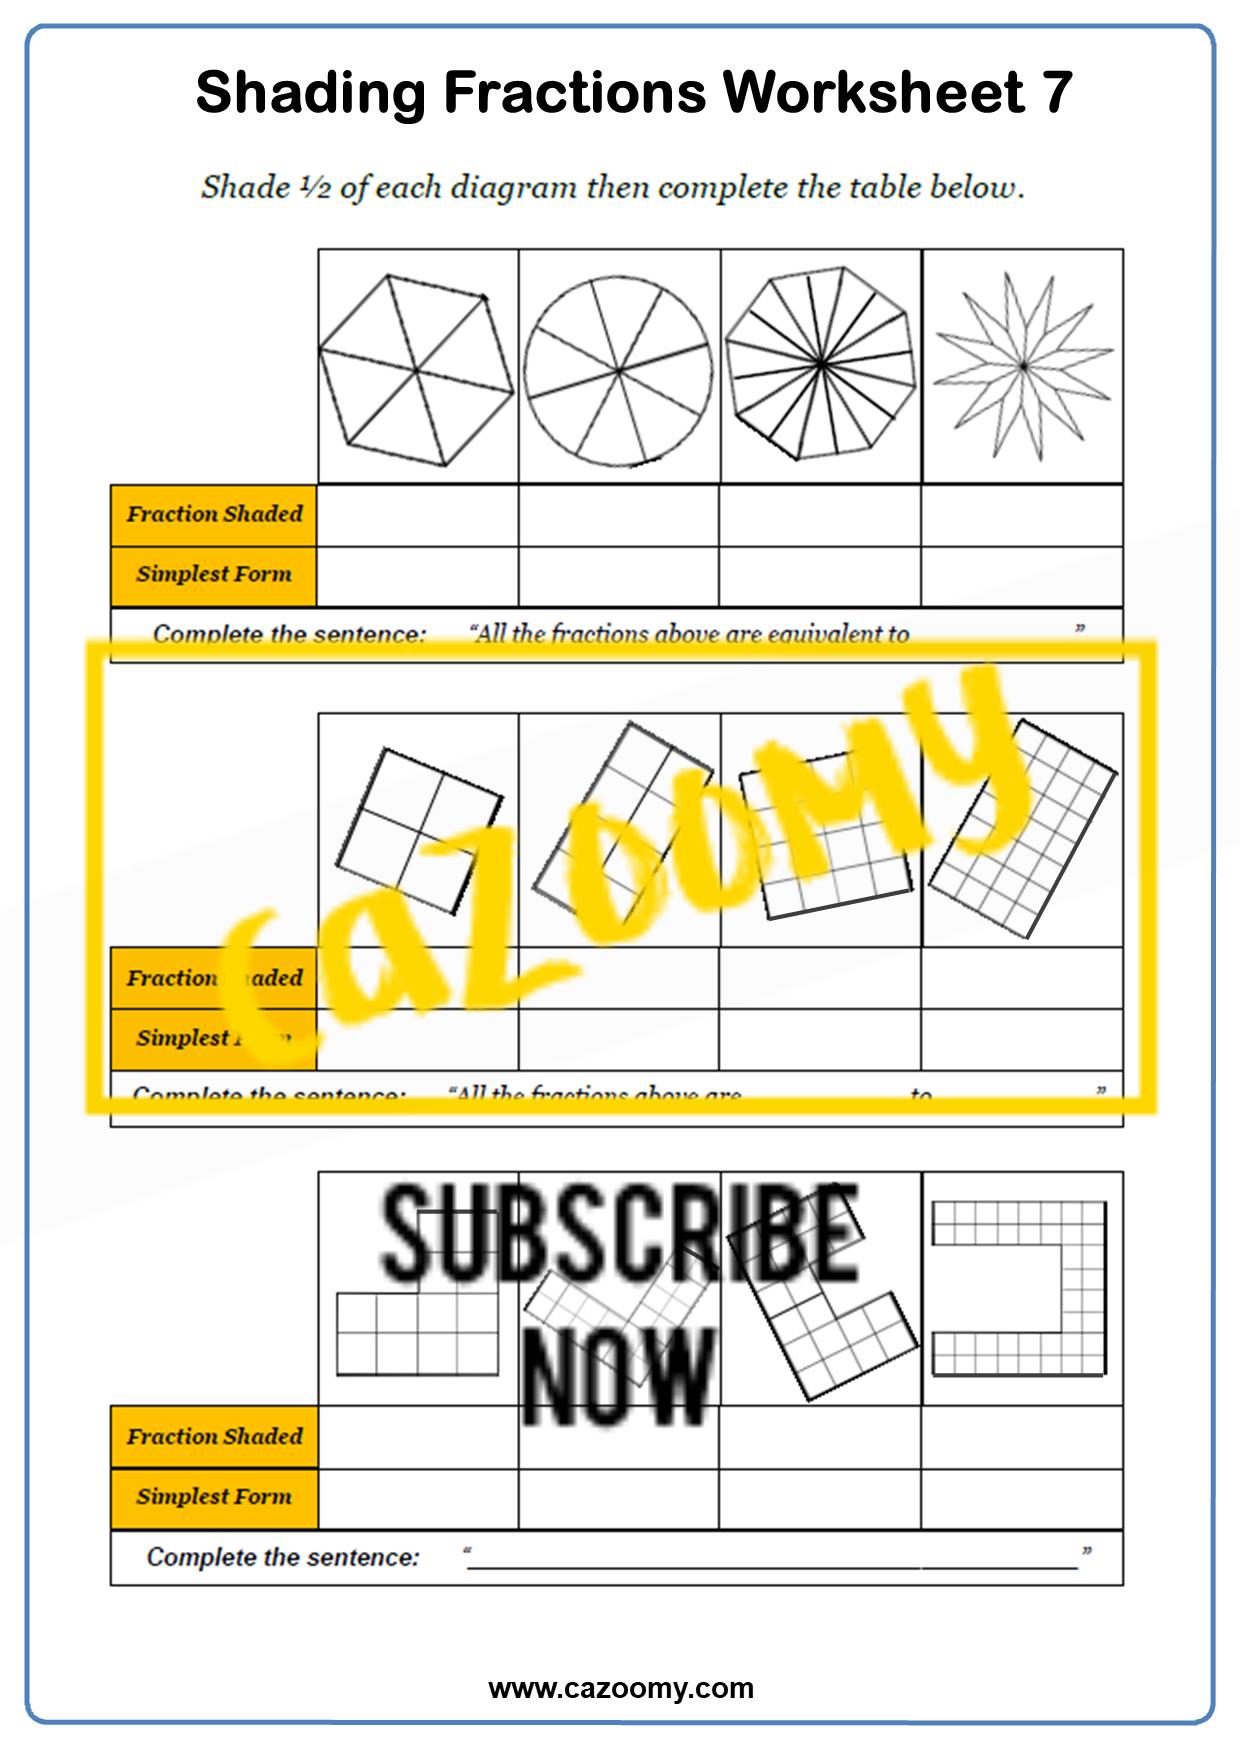 Shading Fractions Worksheet 1